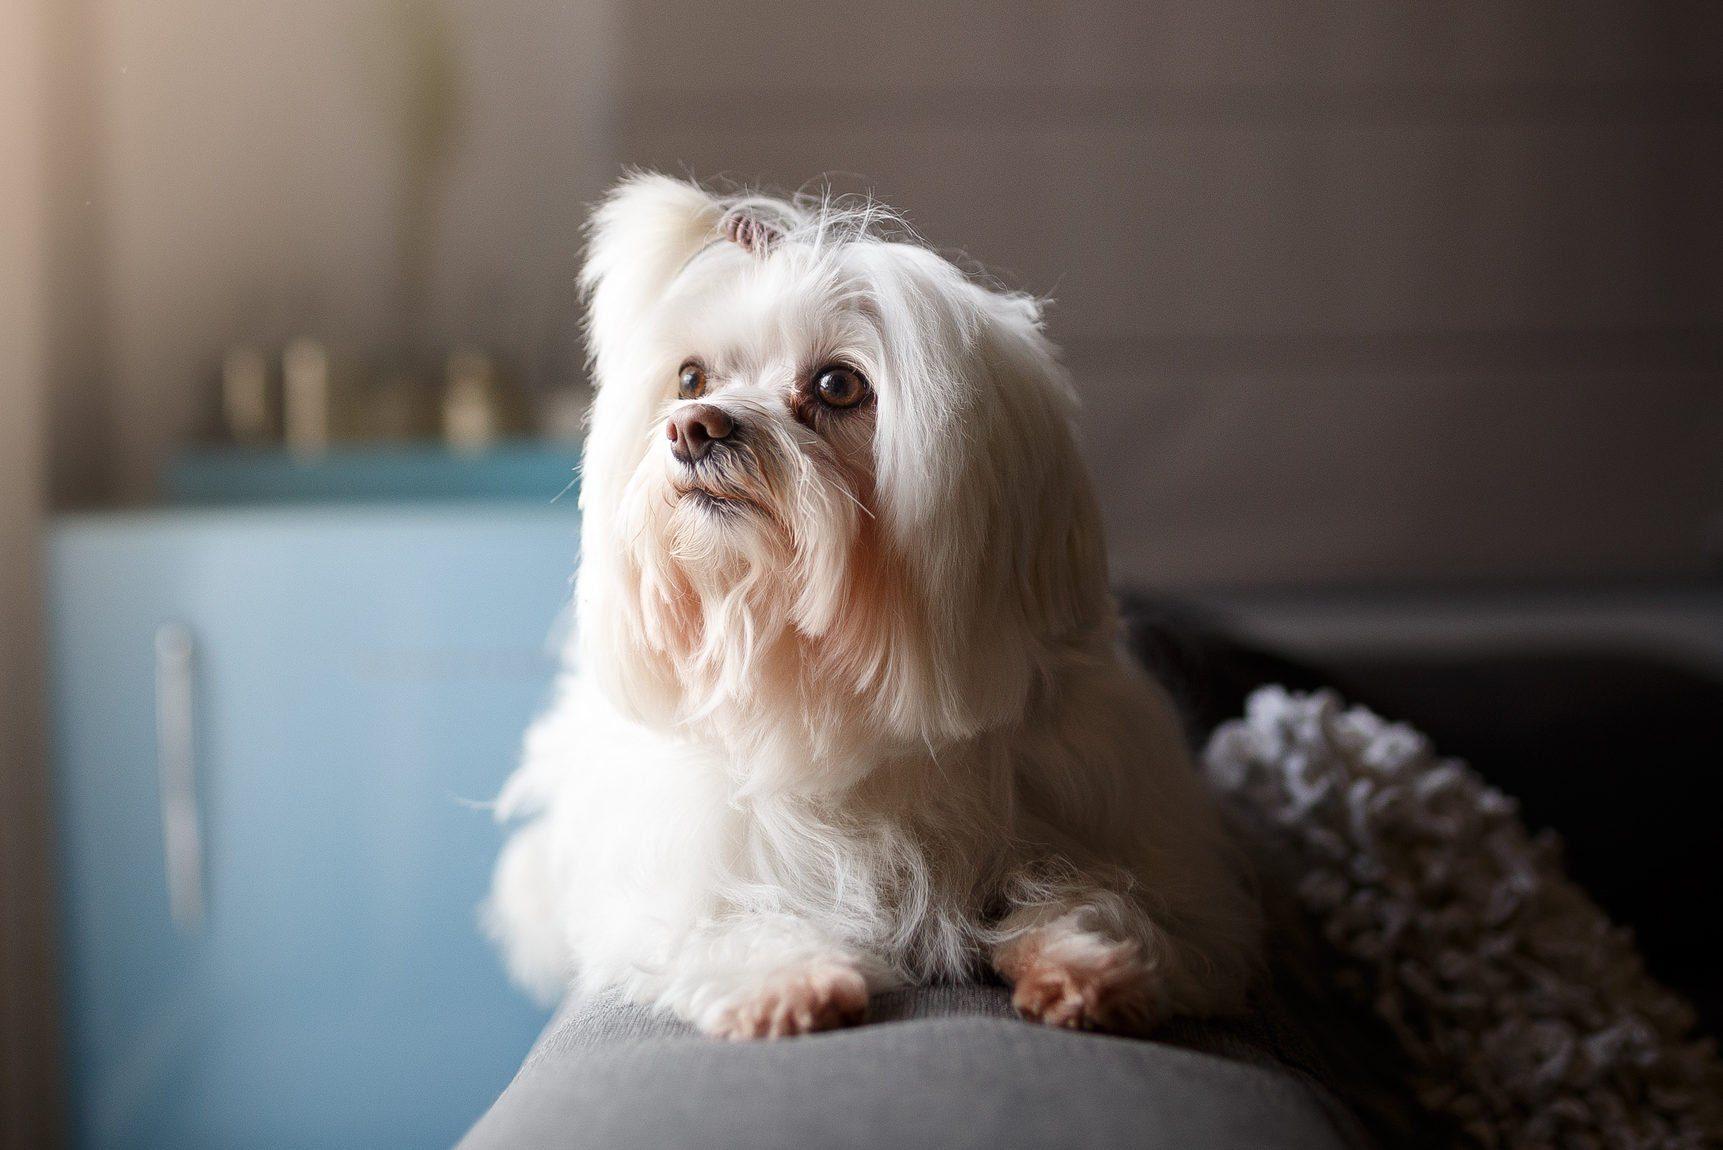 White Lhasa Apso dog portrait